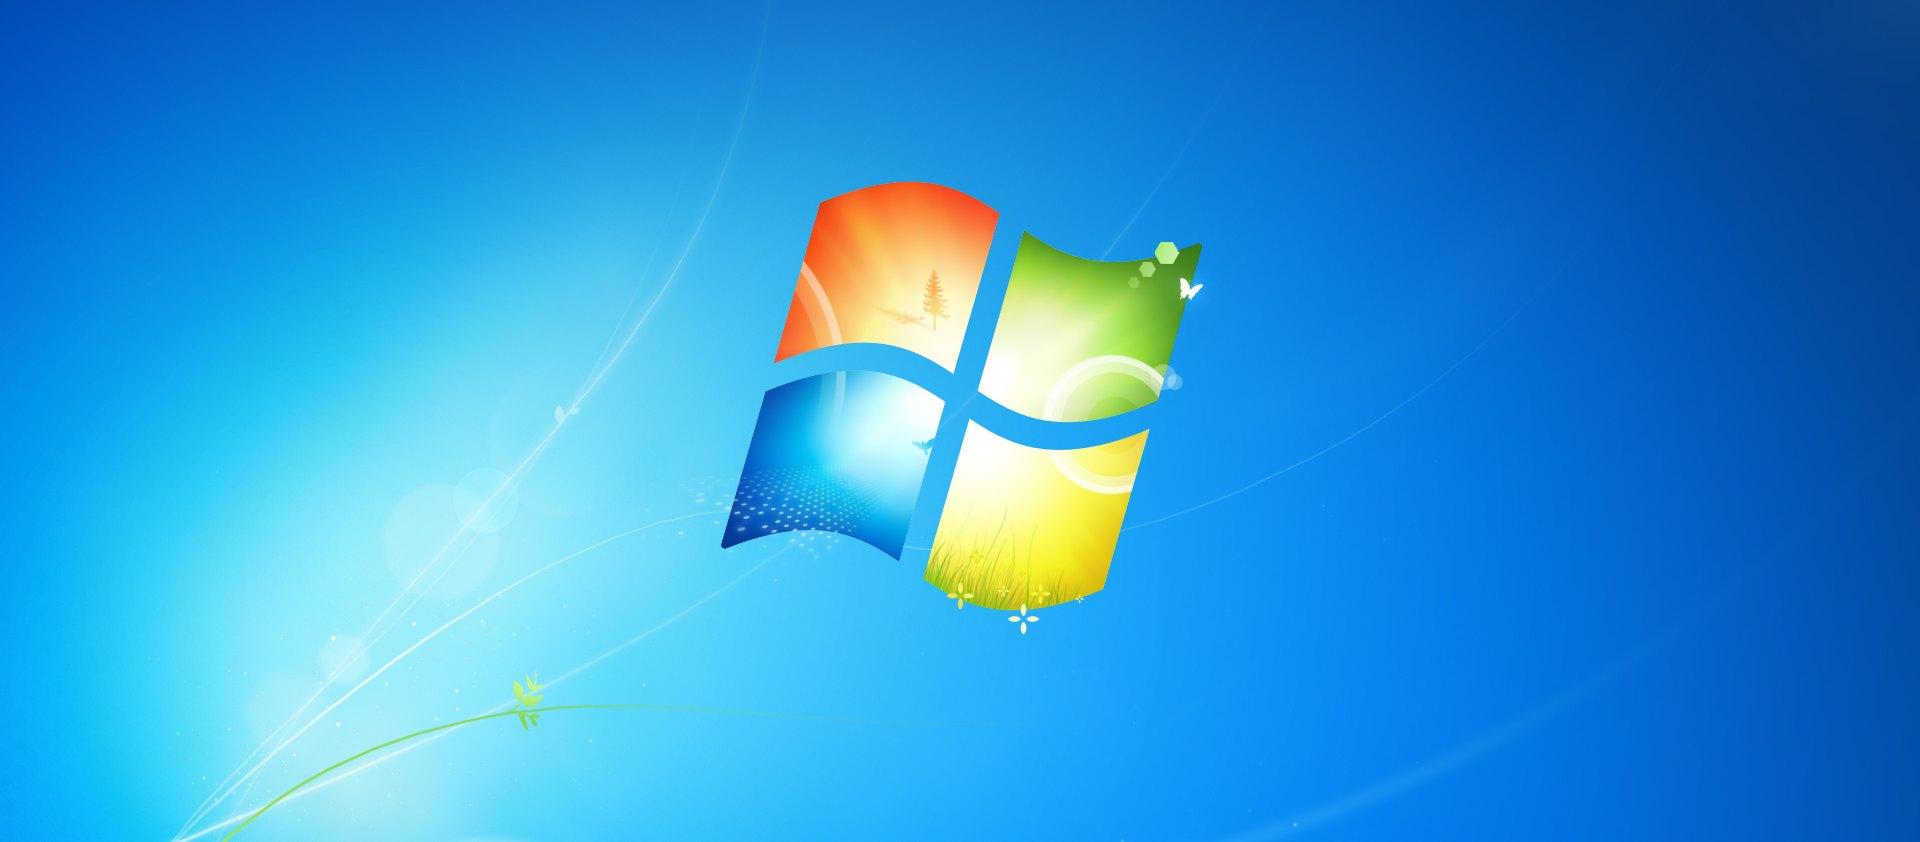 Windows 7 And Windows Server 2008 R2 Service Pack 1